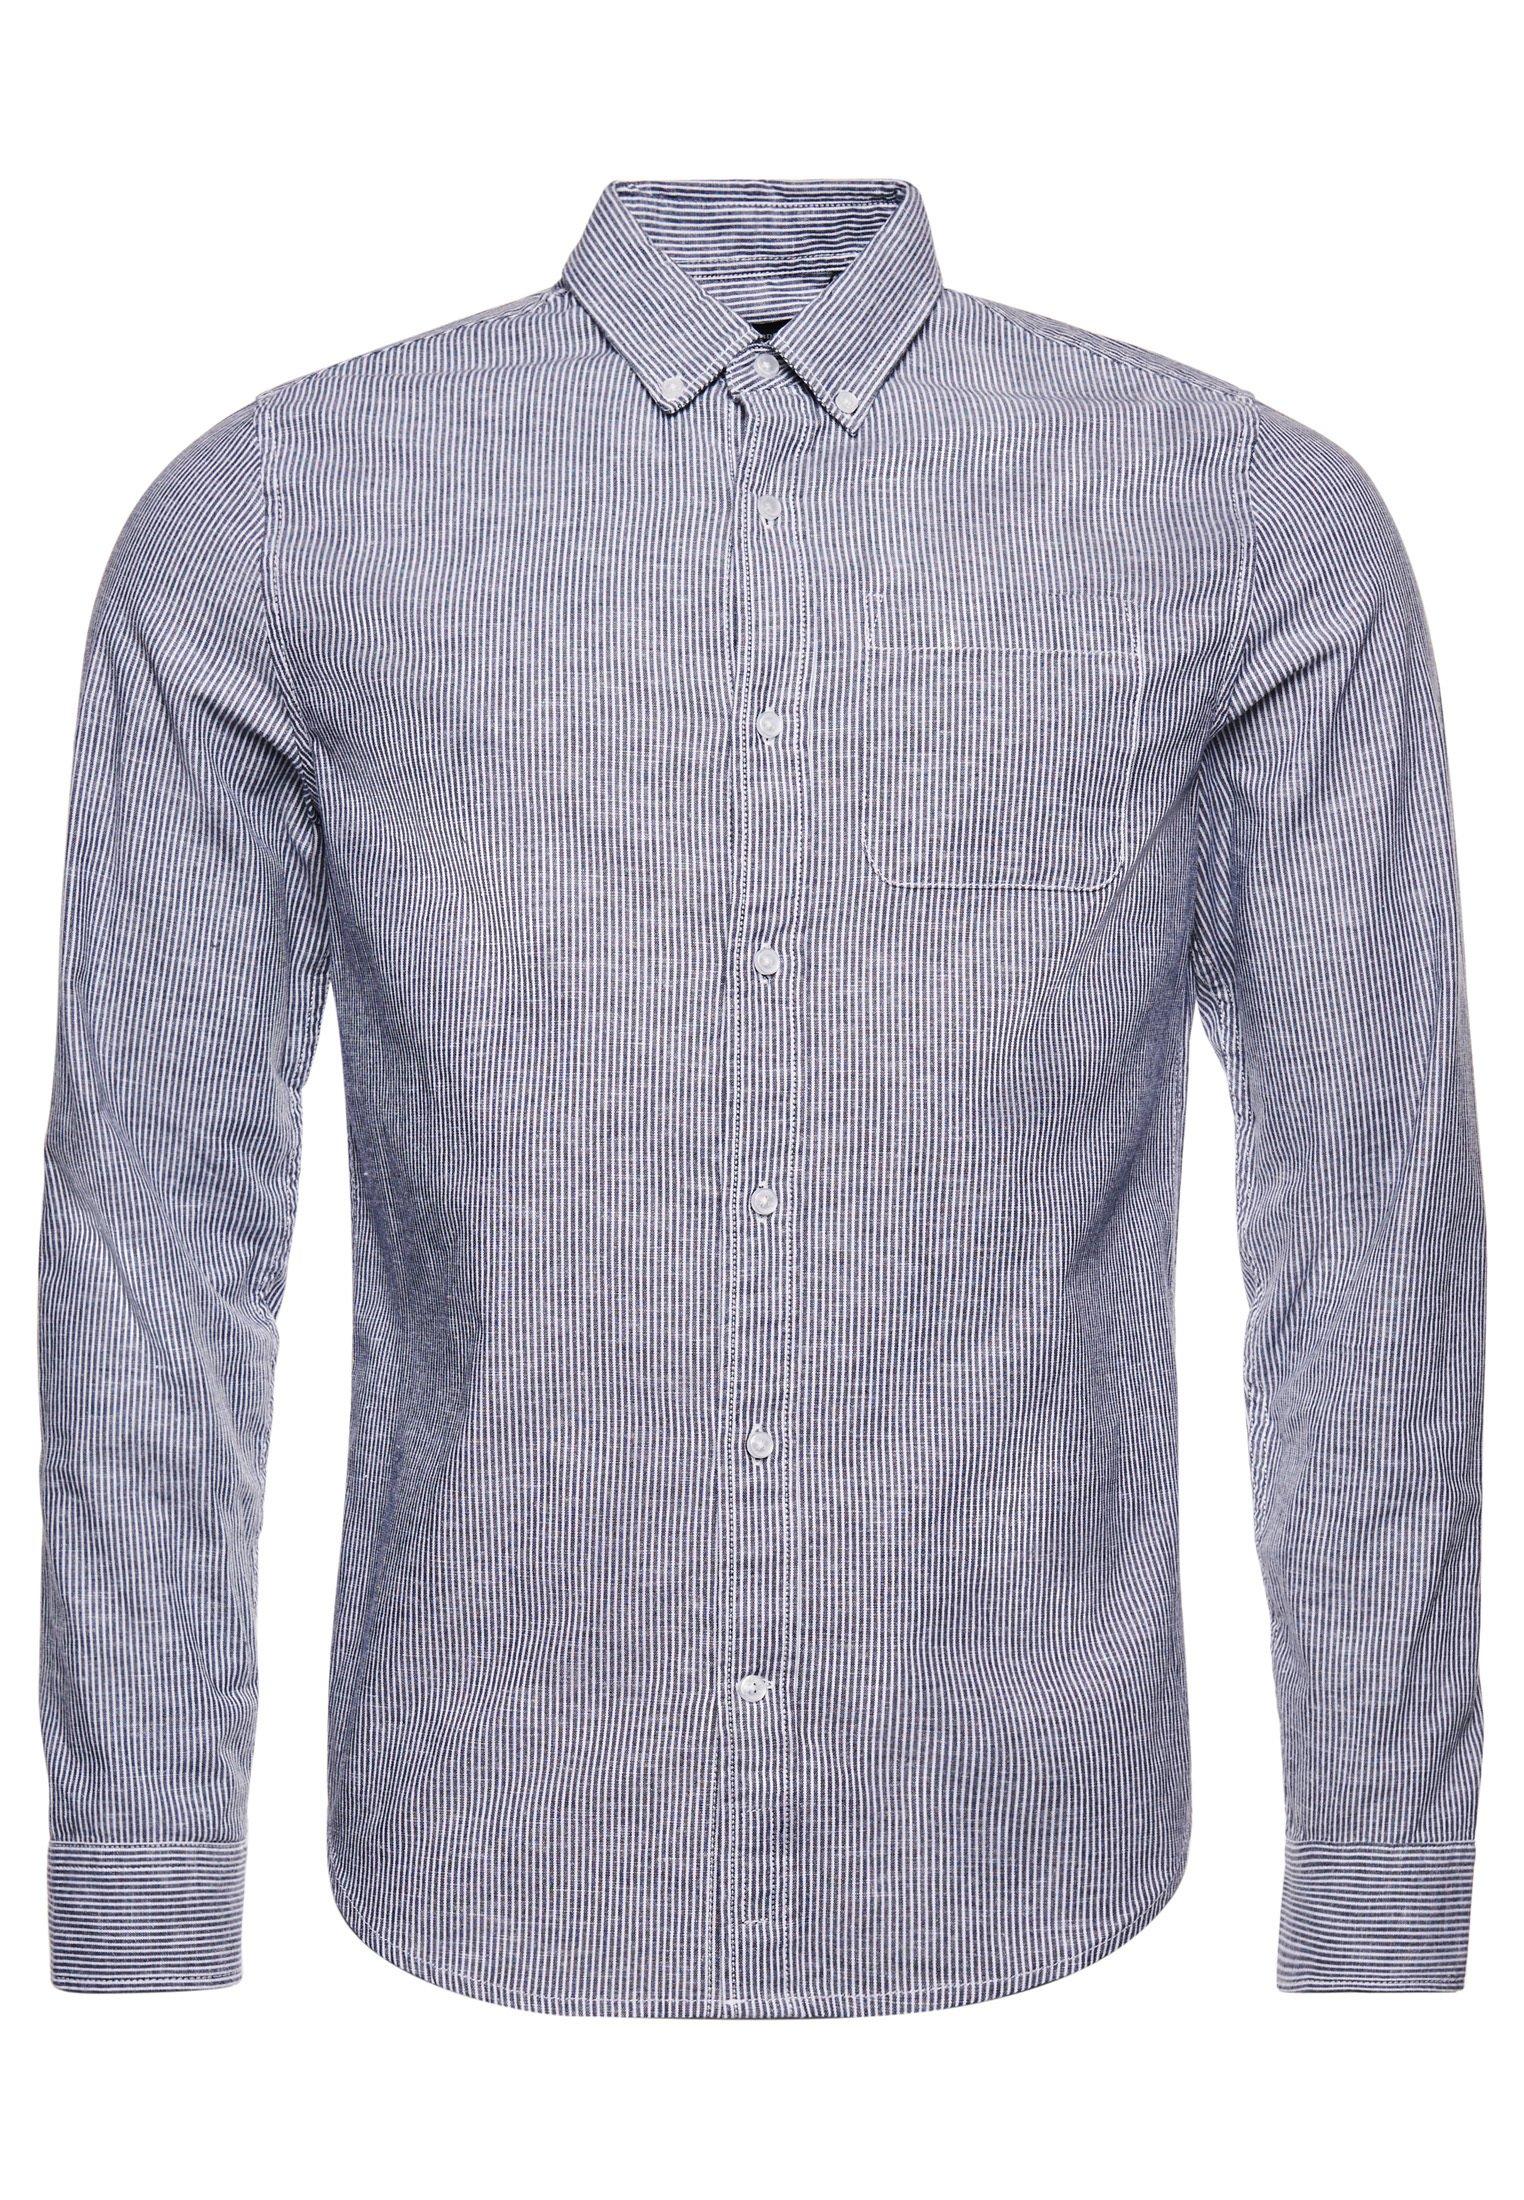 Uomo COTTON LINEN - Camicia